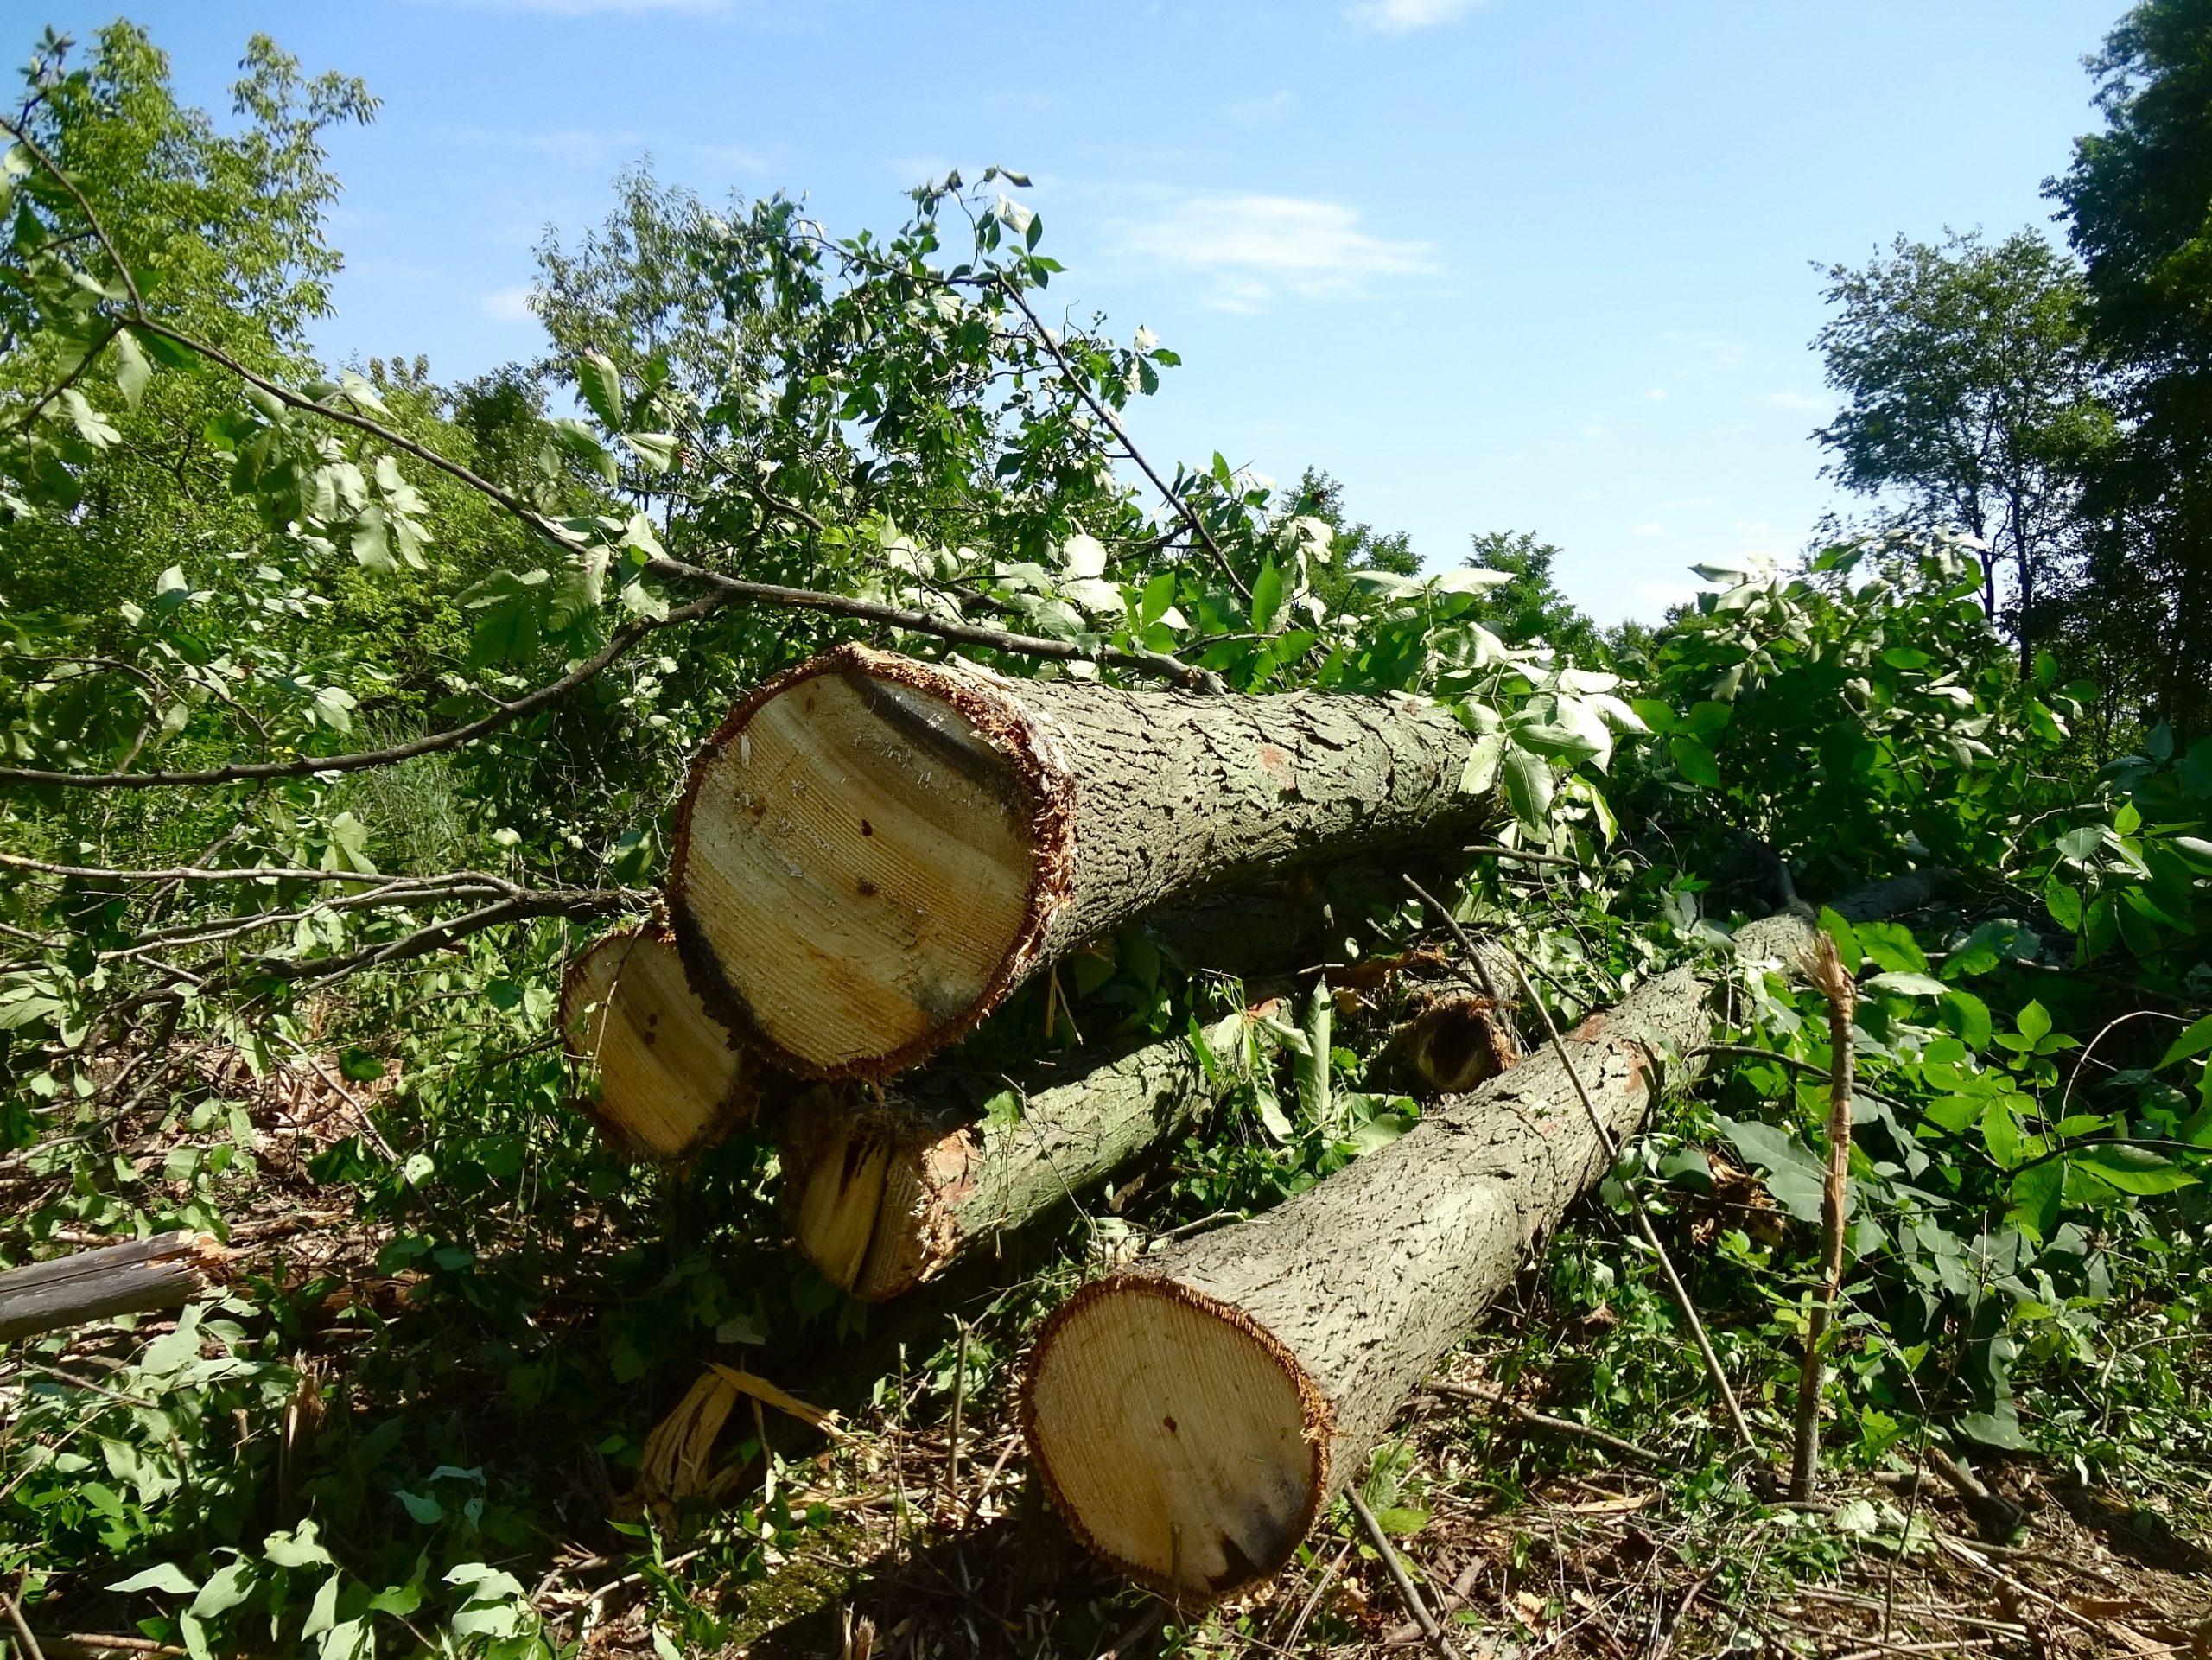 Trees on Debbie Hense's land cut down by Enbridge.